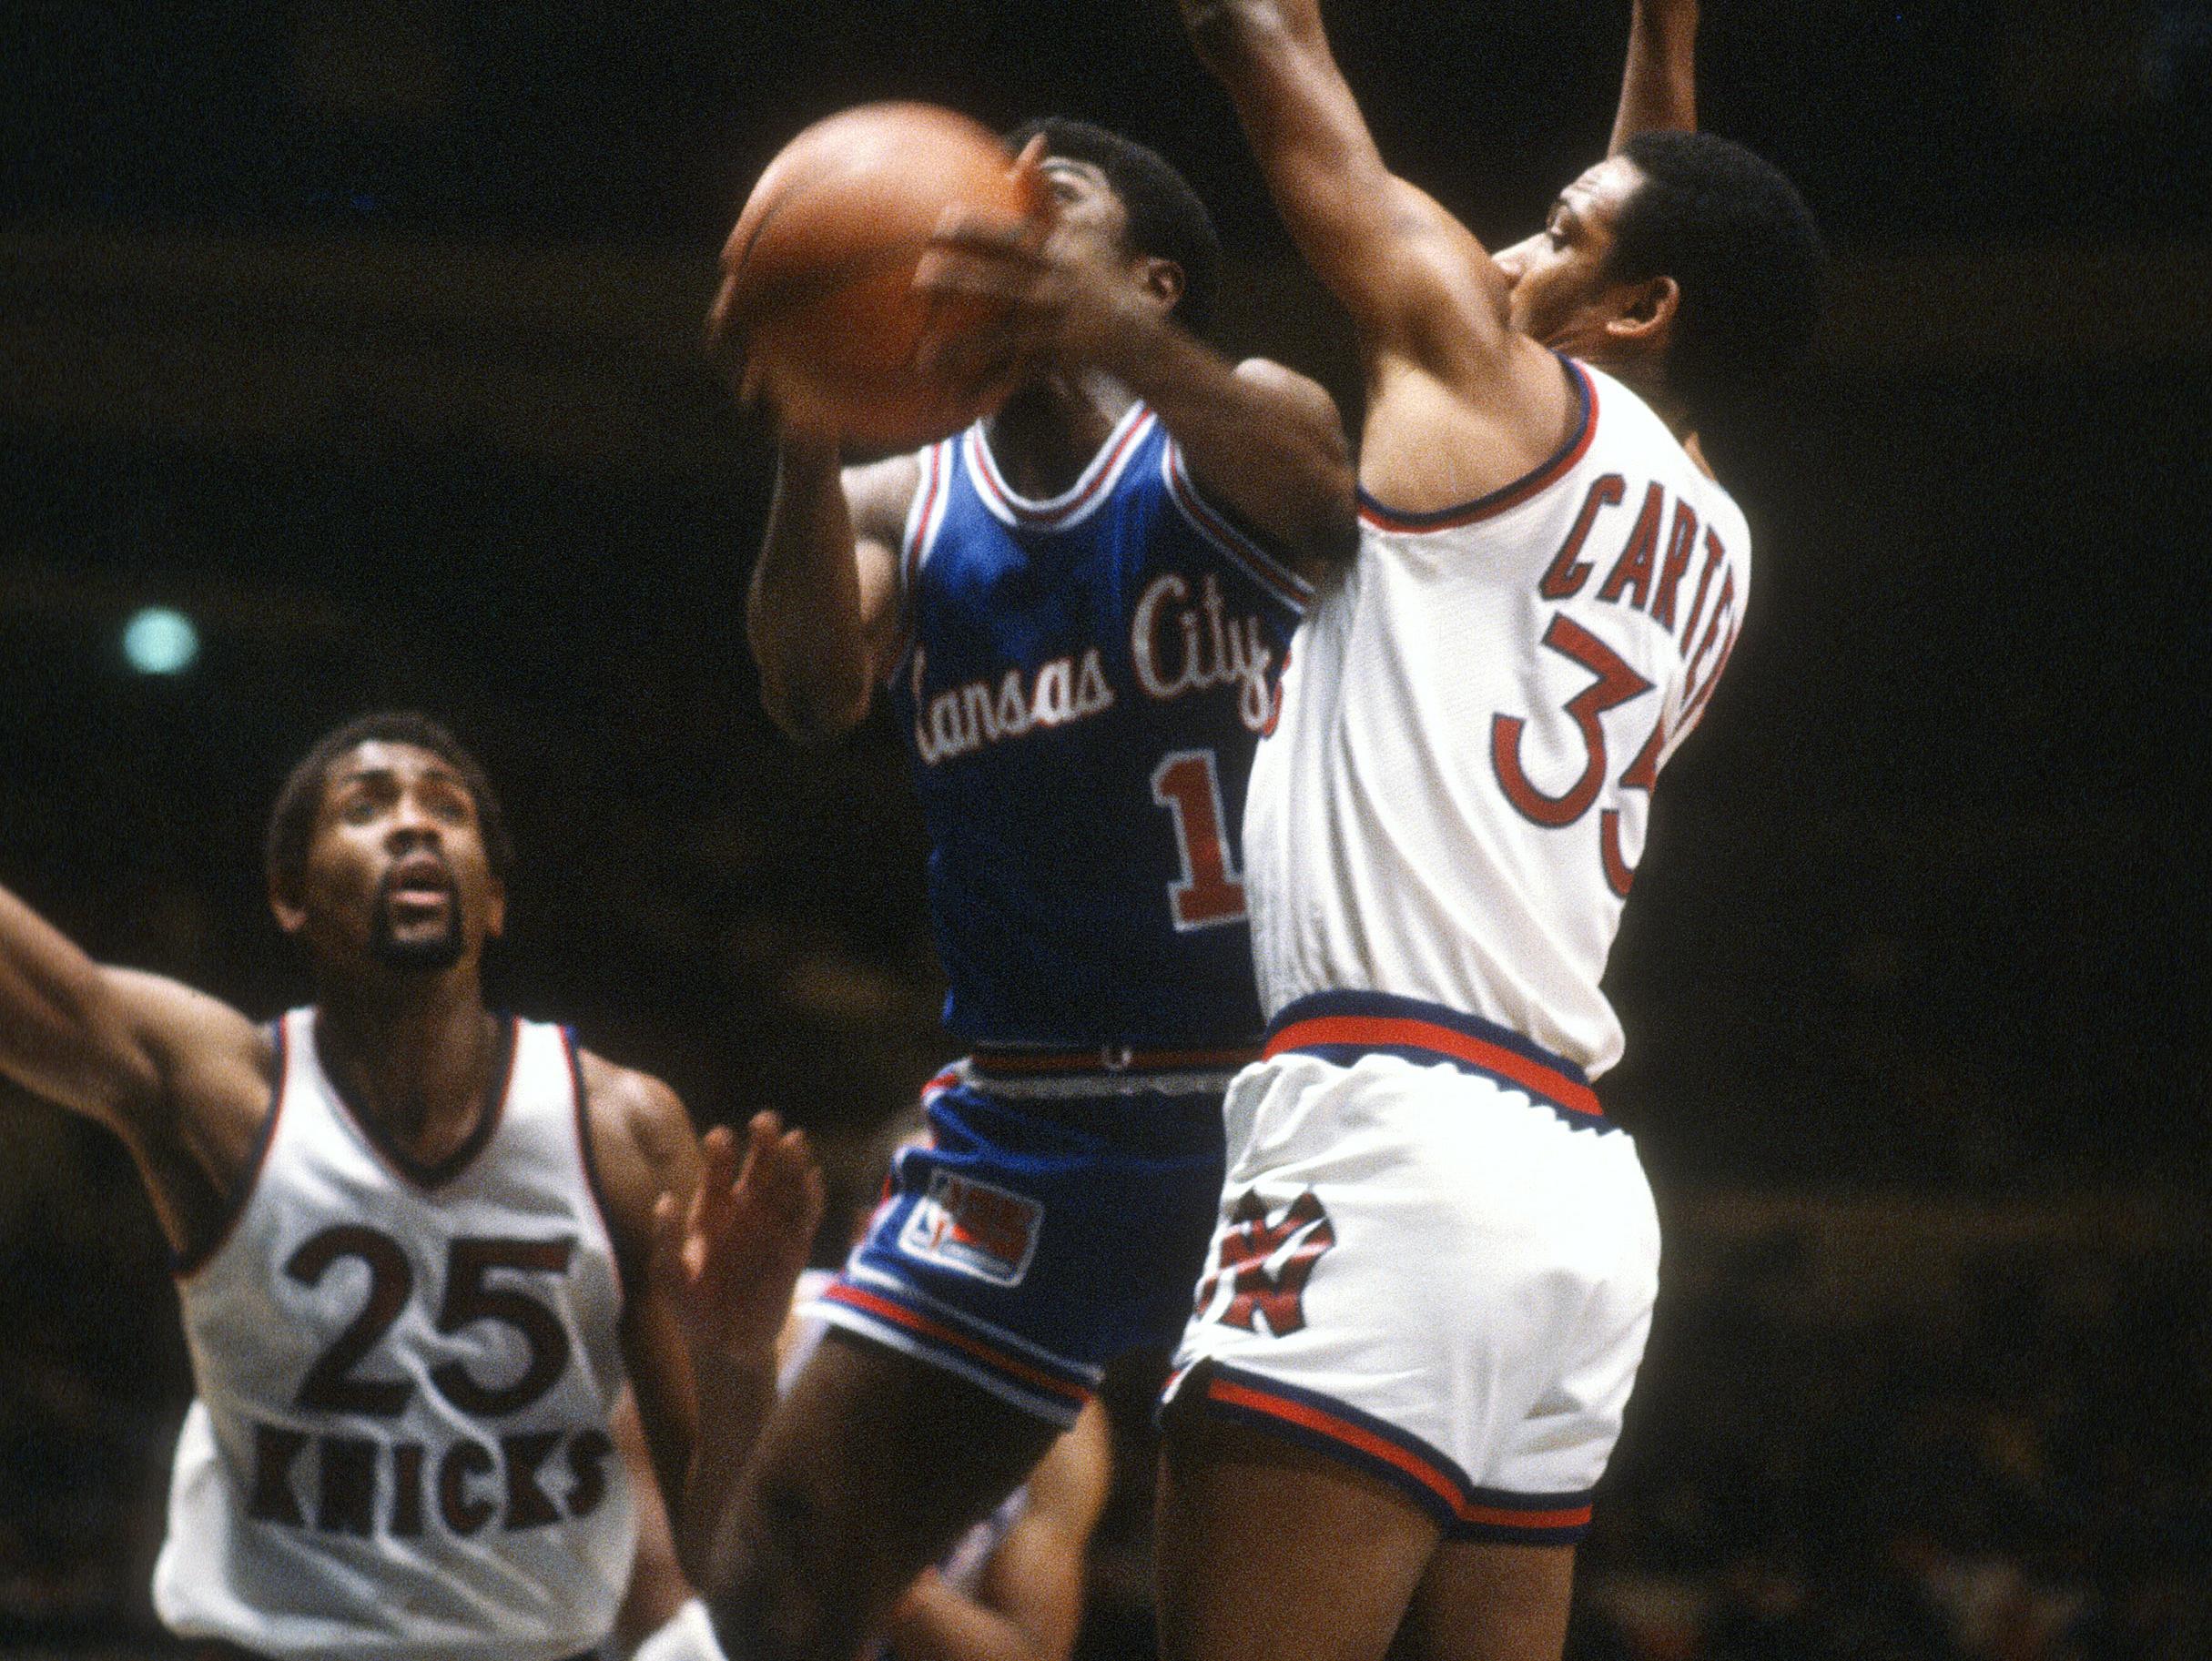 knicks 1981 throwback uniforms